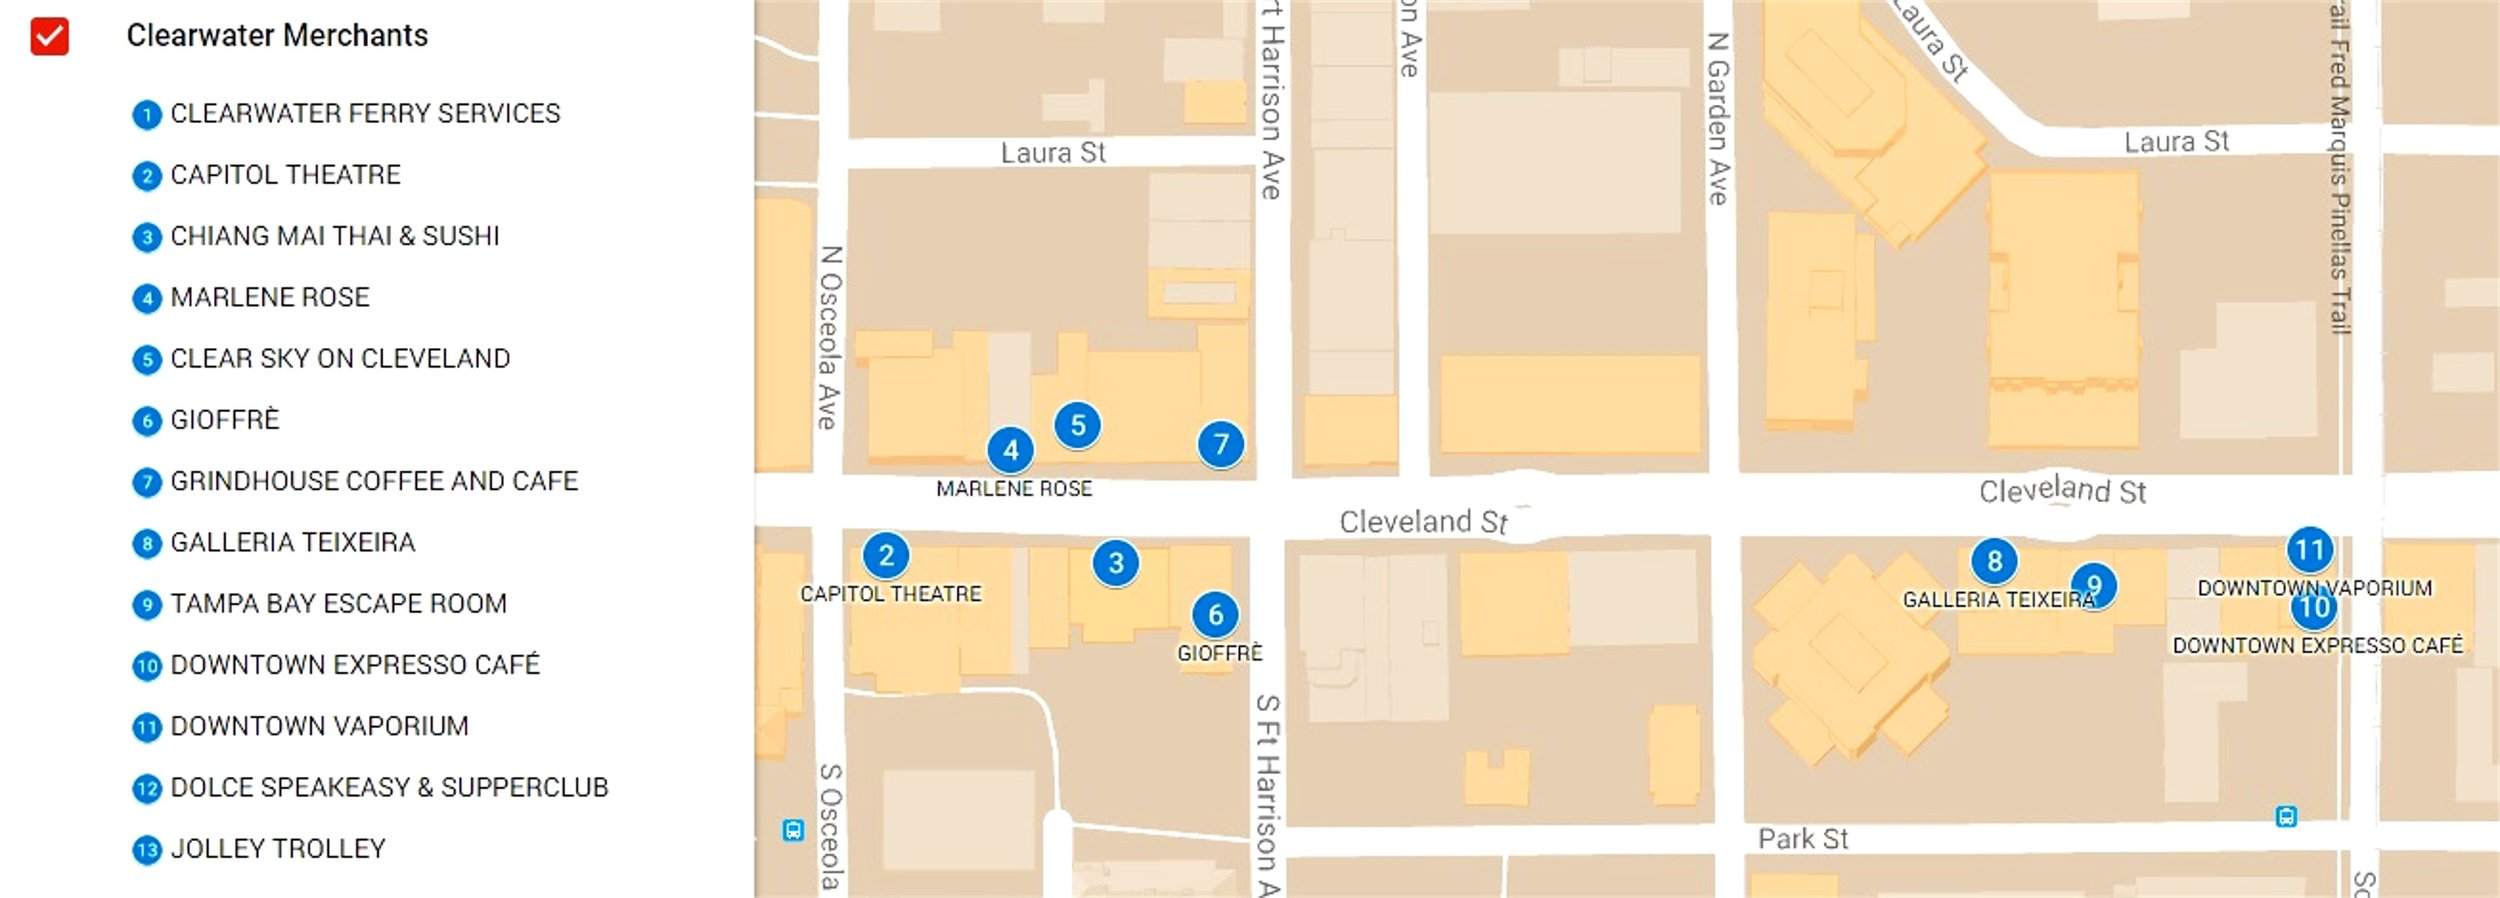 Downtown_Clearwater_Merchant_association_Member_map_tampa_bay_beach_florida.jpg